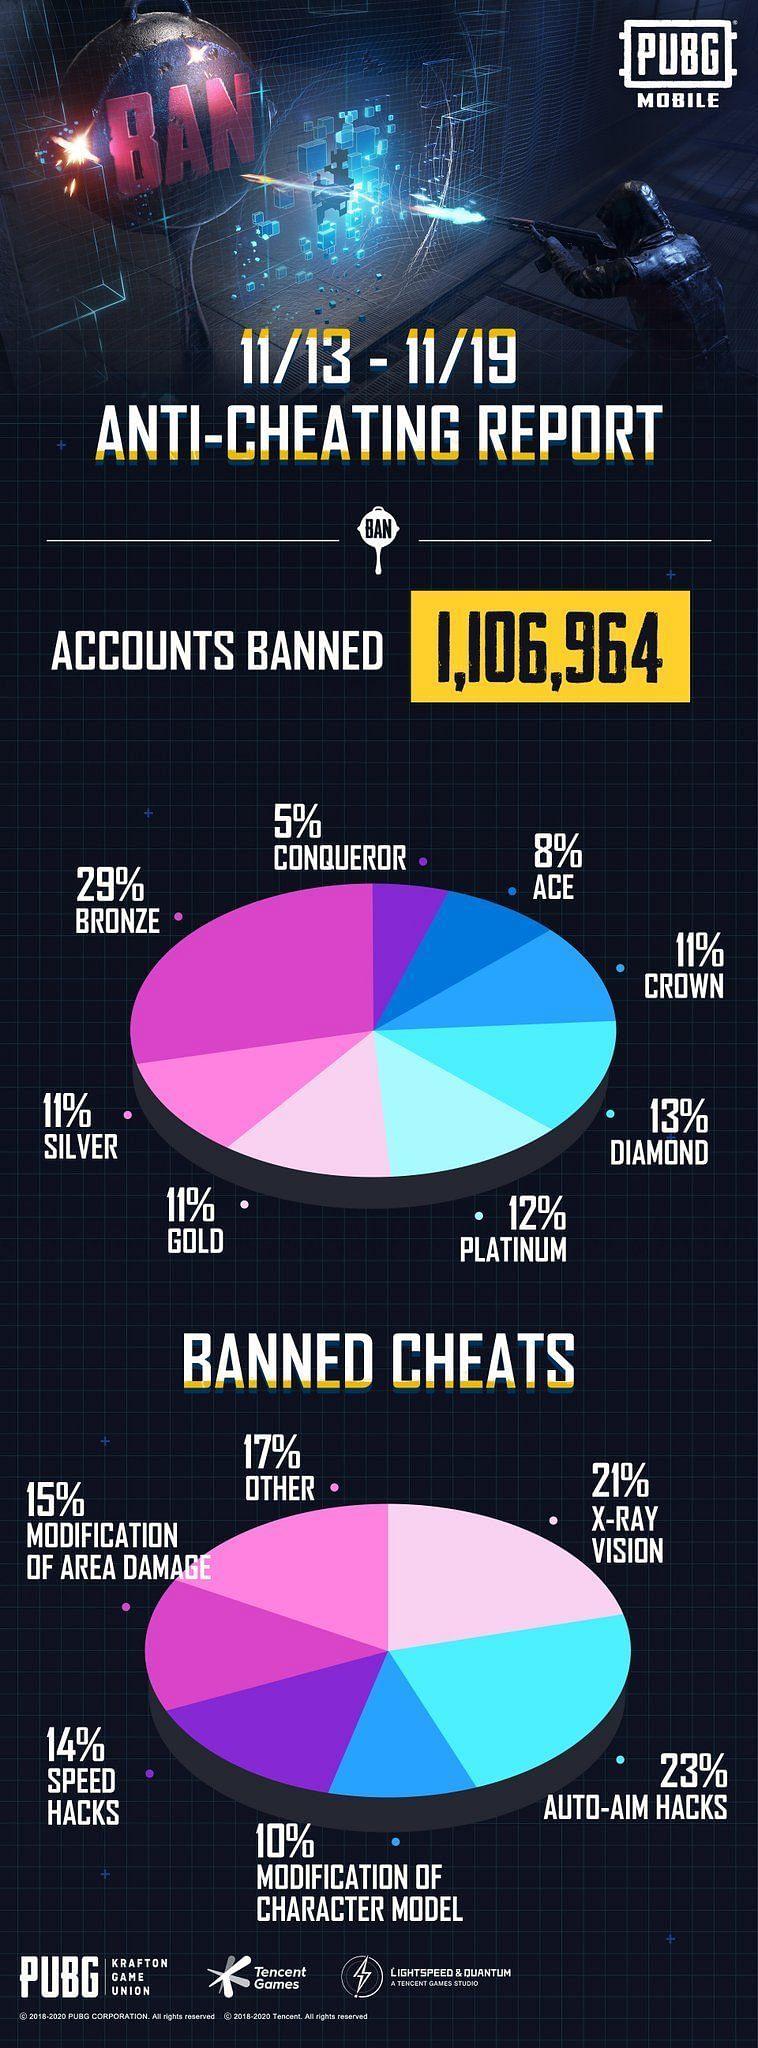 Anti-cheating reports